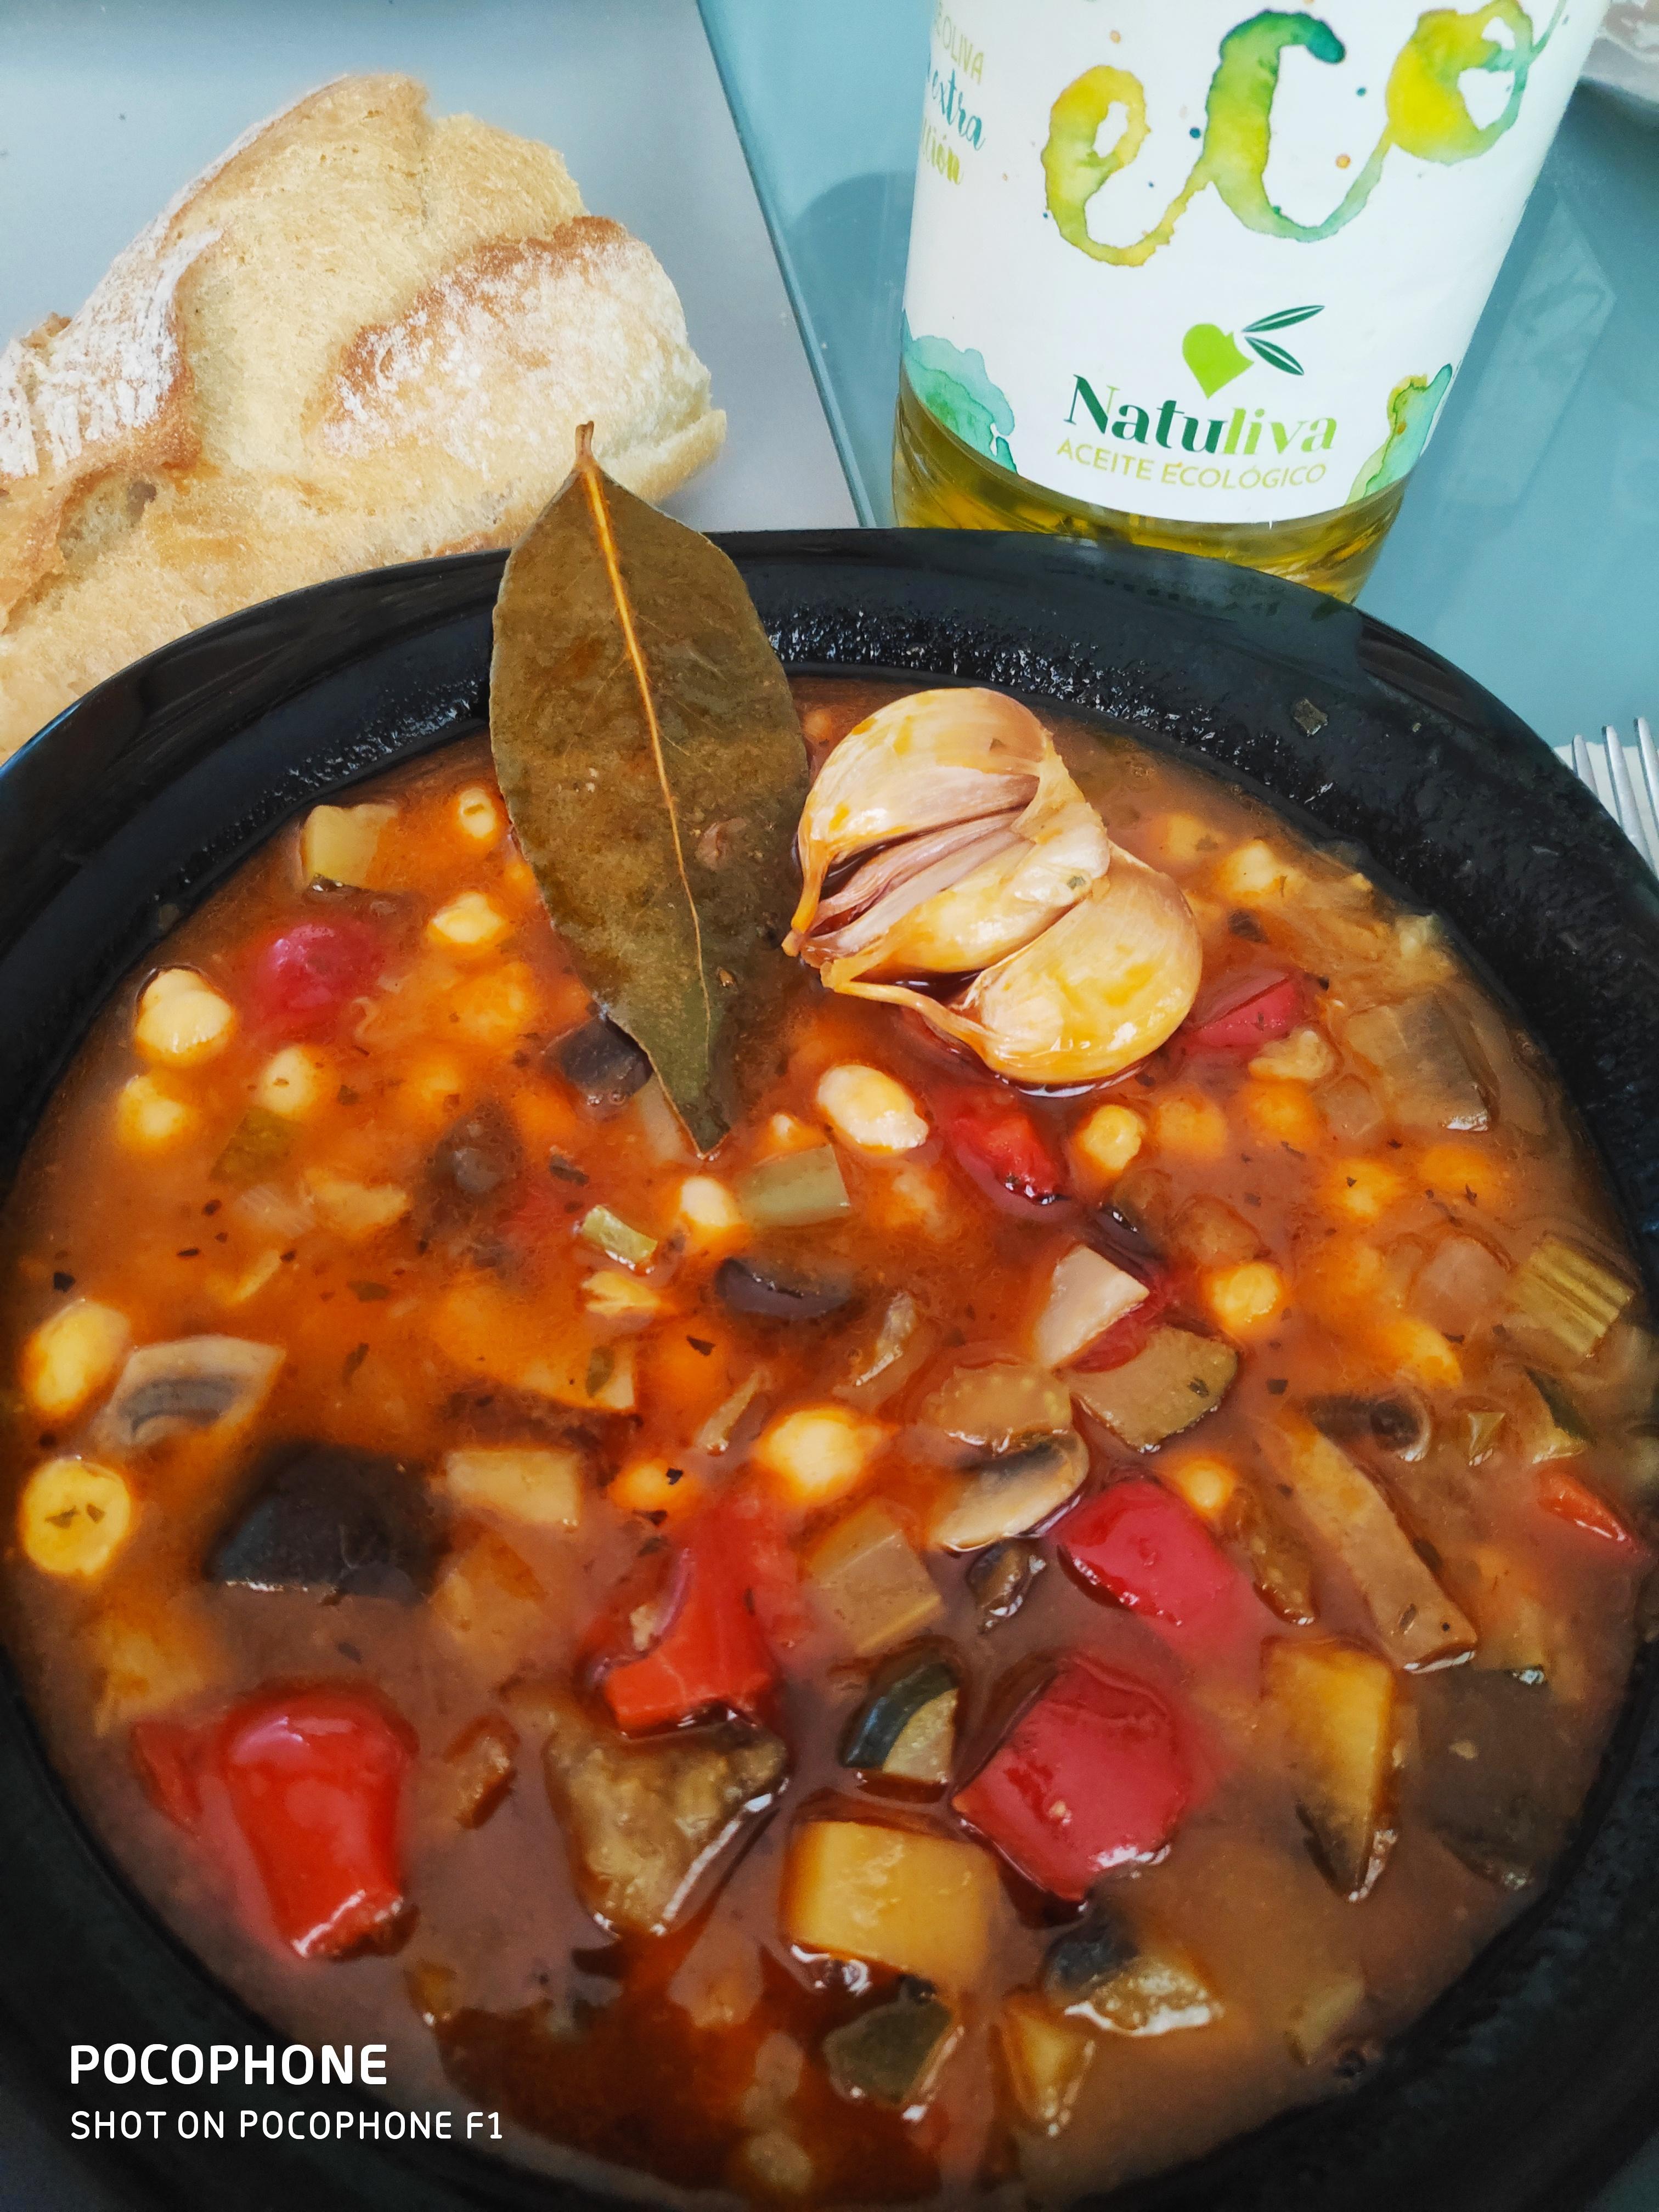 Este domingo unos garbanzos con verduras al estilo Natuliva 😉😋 (osea: ricos, ricos, ricos ...)